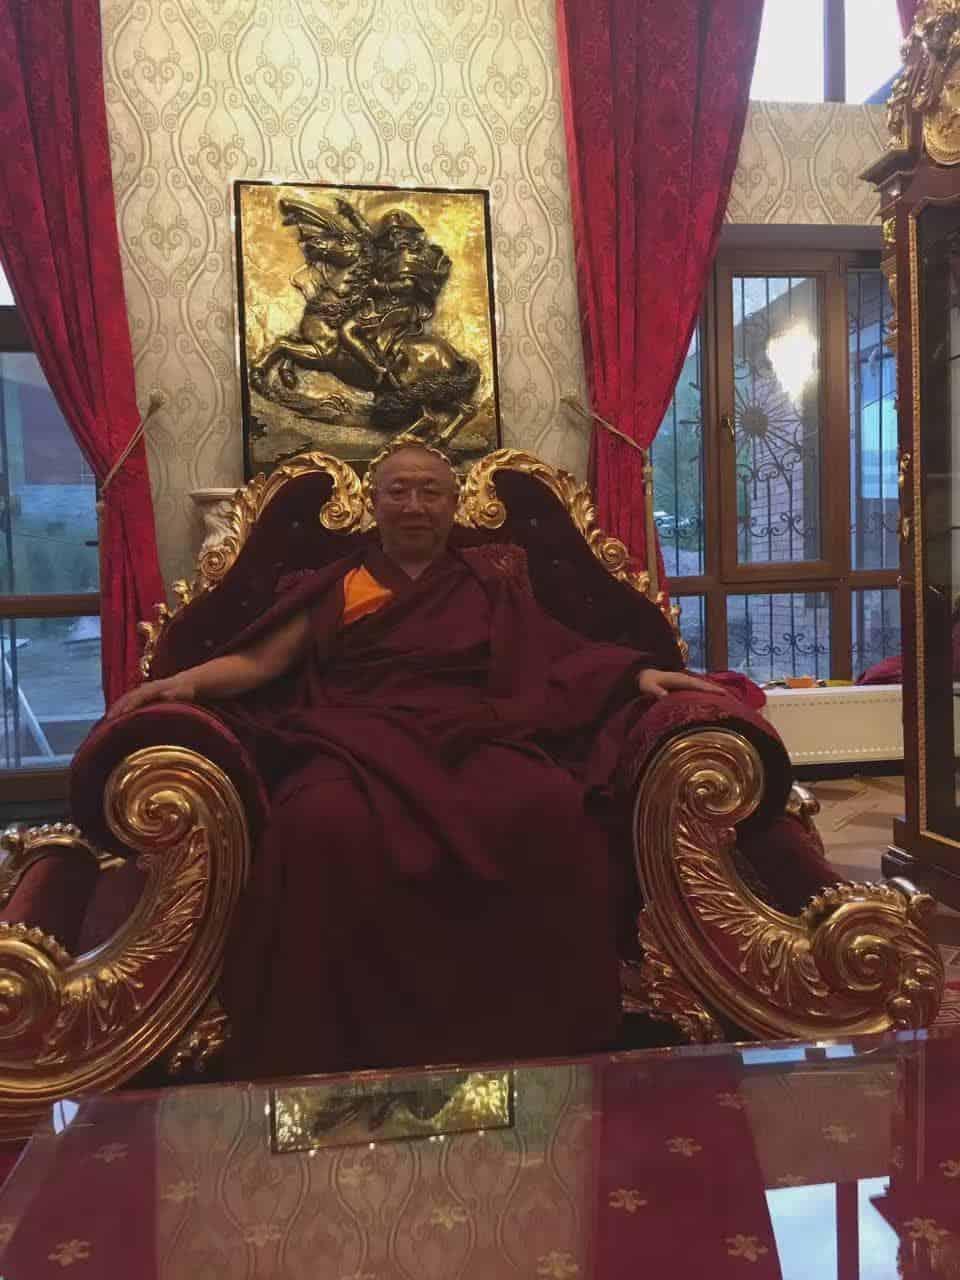 gosok-rinpoche-mongolia-2016-0cdad7d2d3f492dc85c769ddf223116